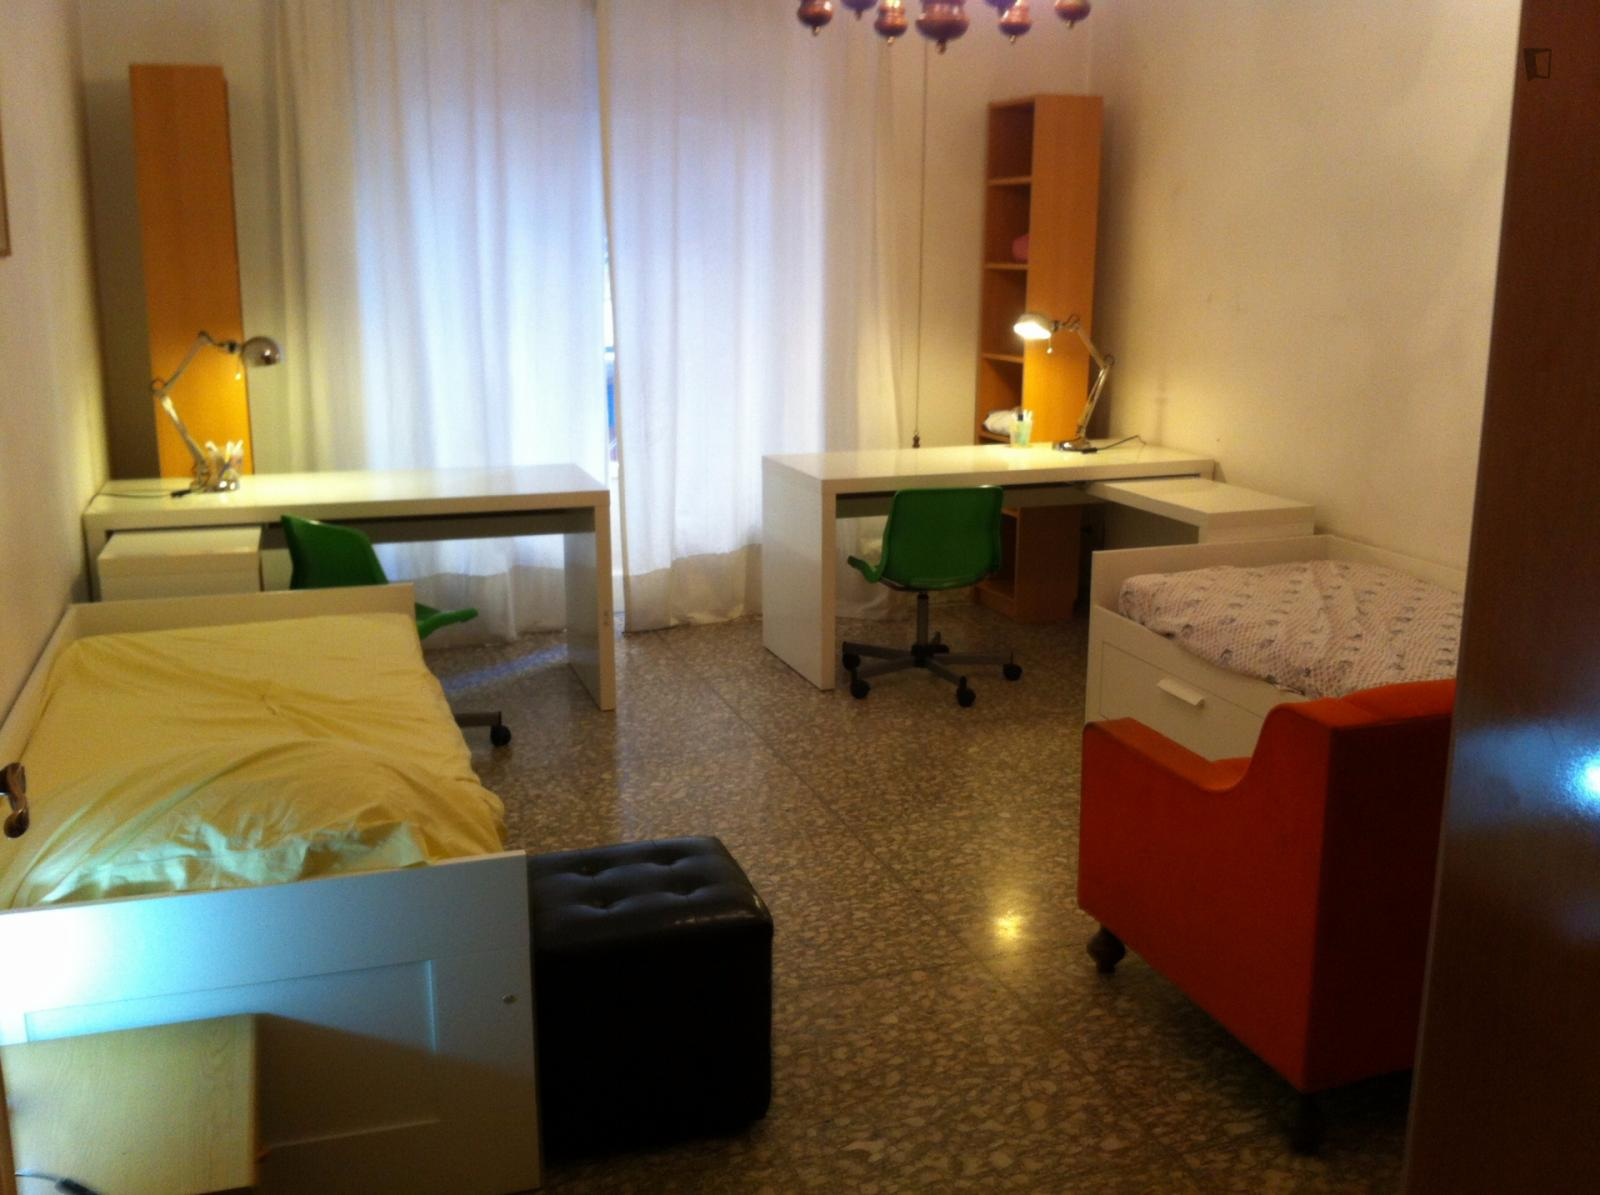 Via Orso Mario Corbino, Rome, ME - 280 USD/ month